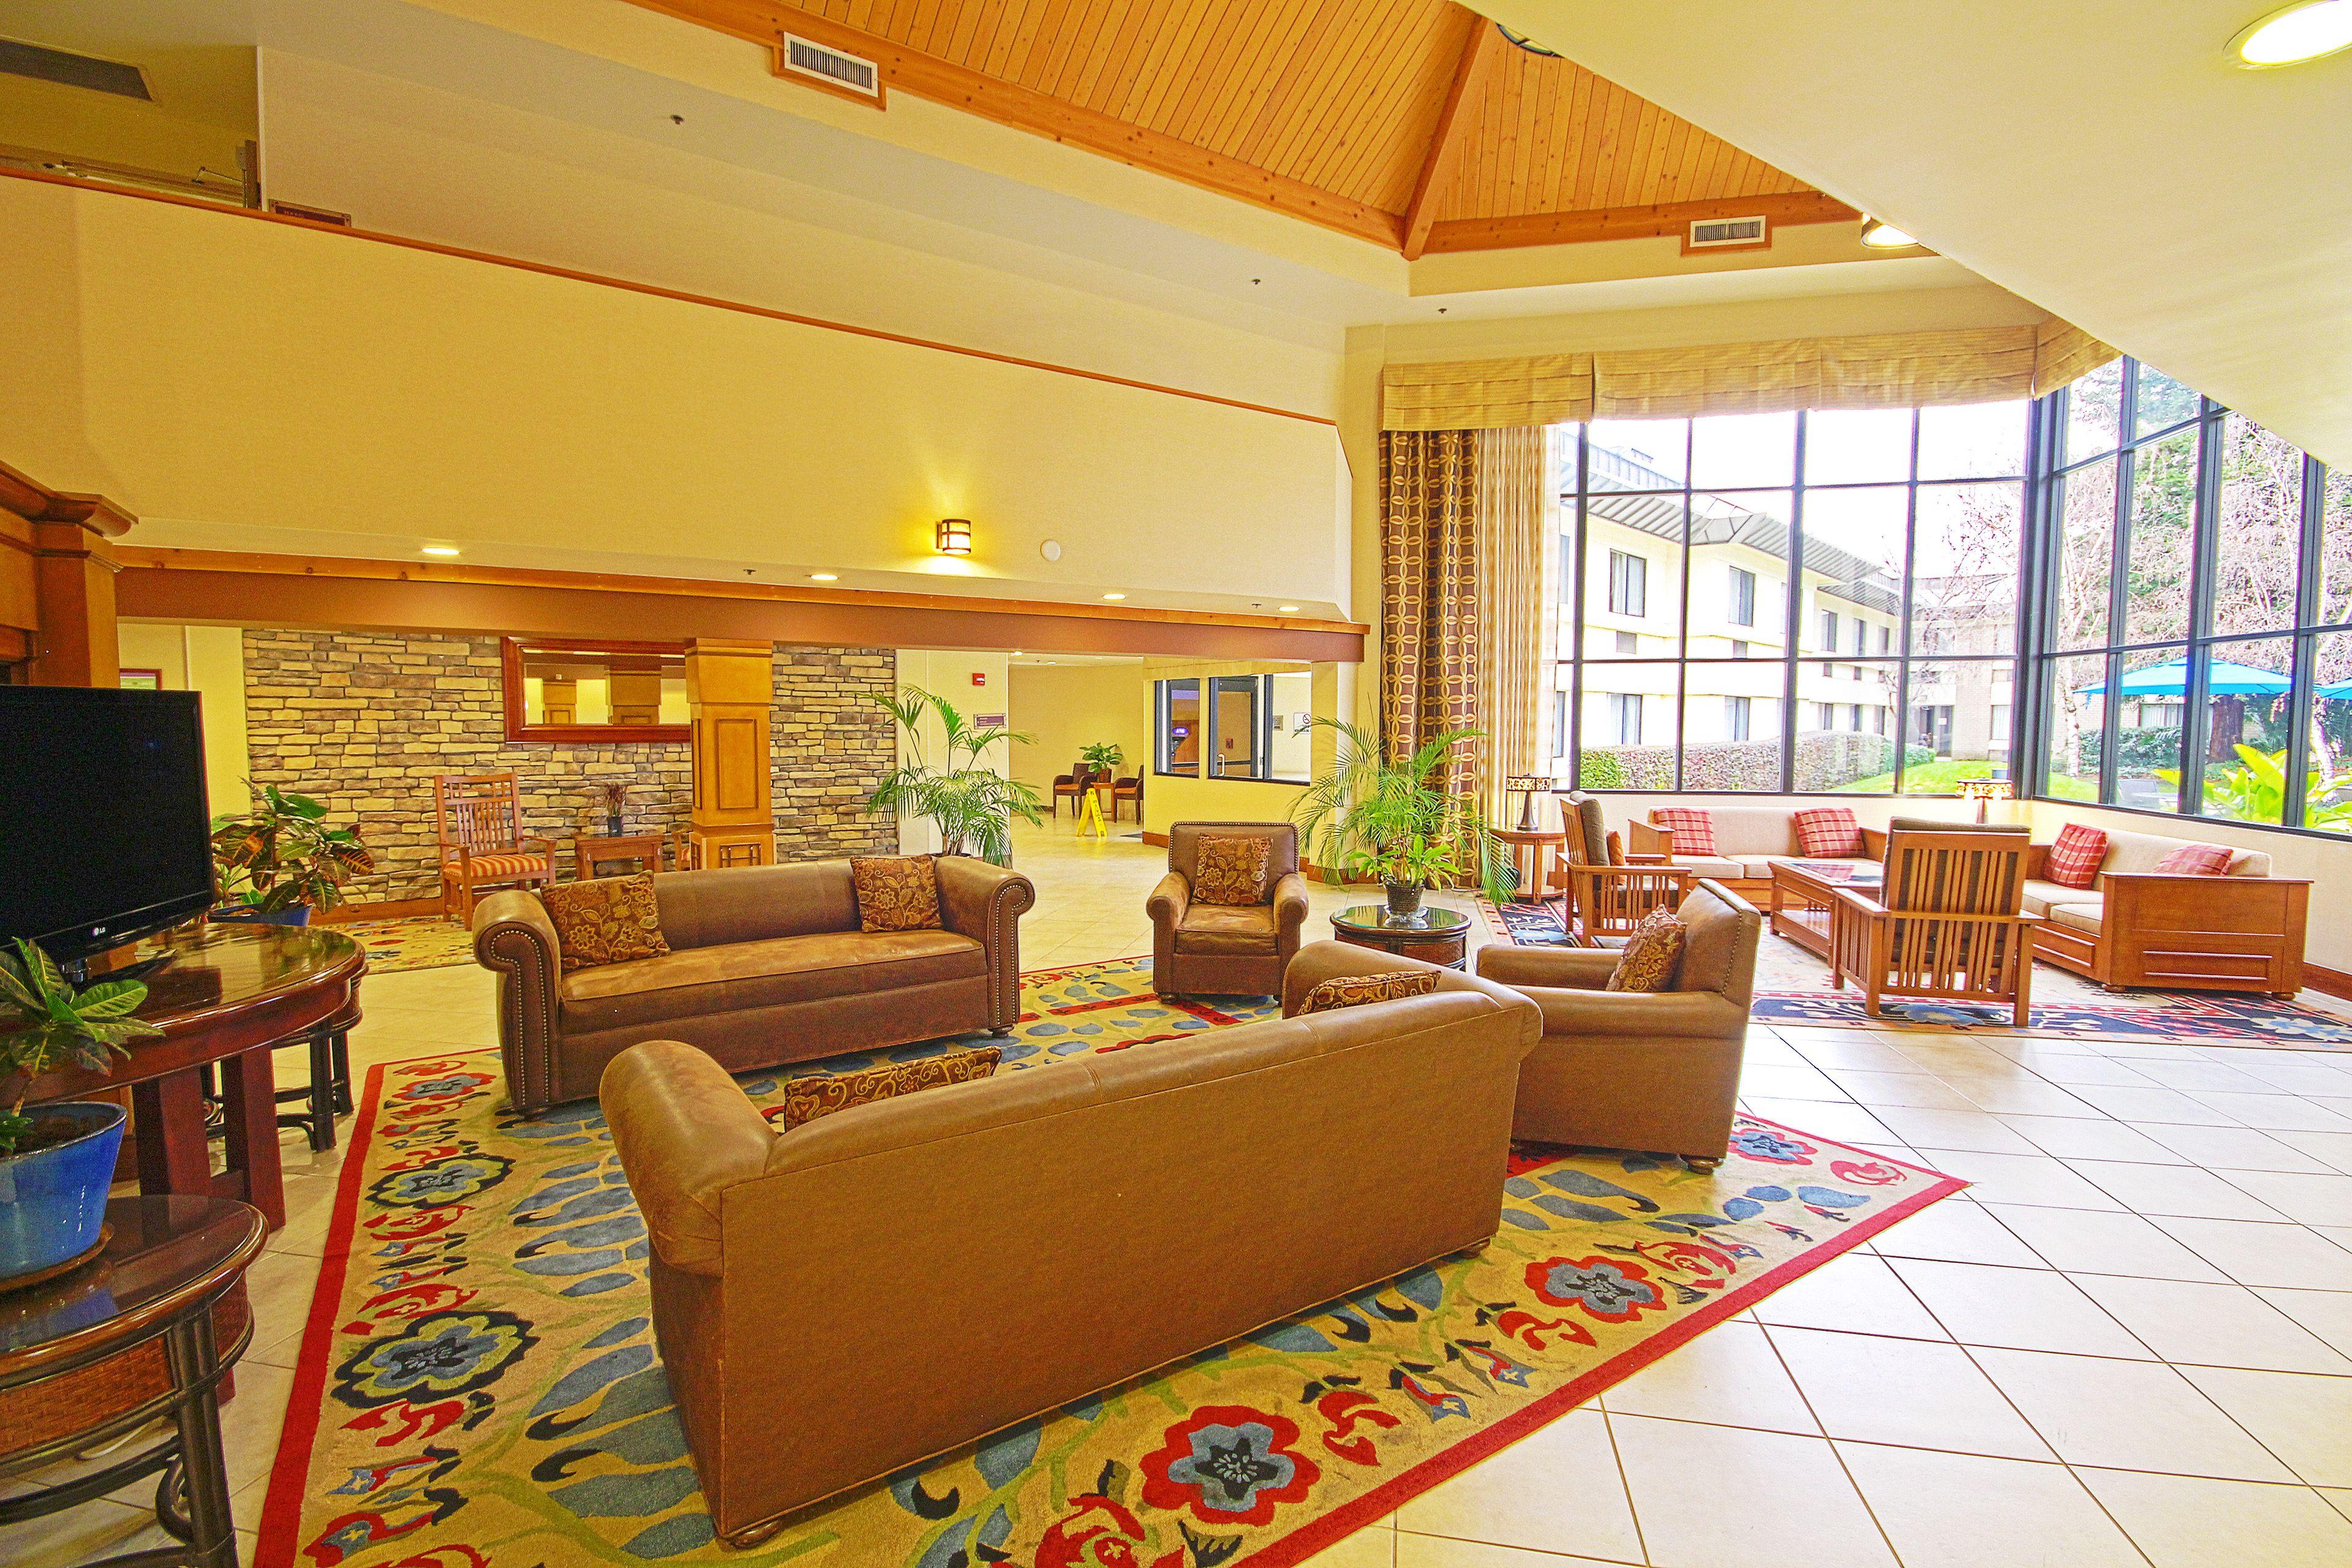 Holiday Inn Express Walnut Creek image 3